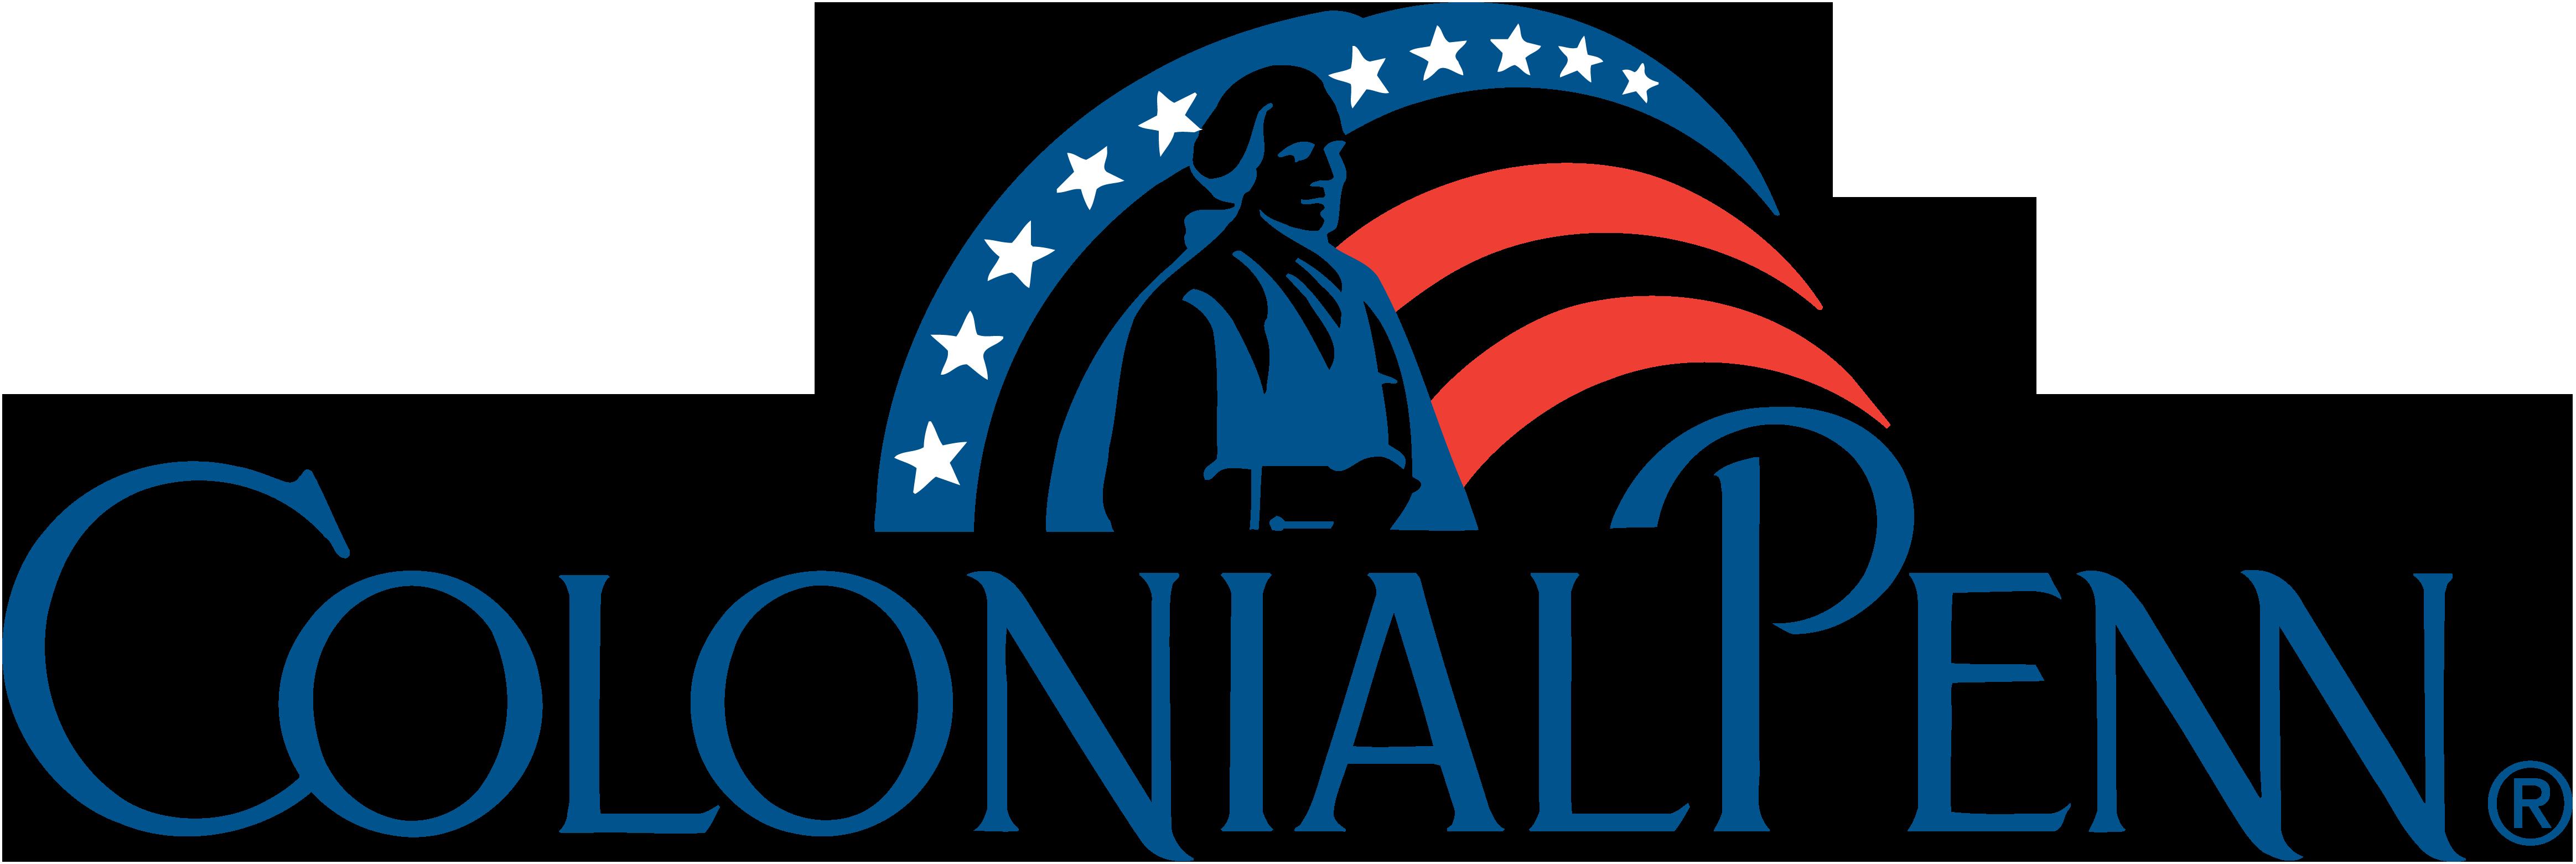 Home ColonialPenn Colonial penn, Life insurance